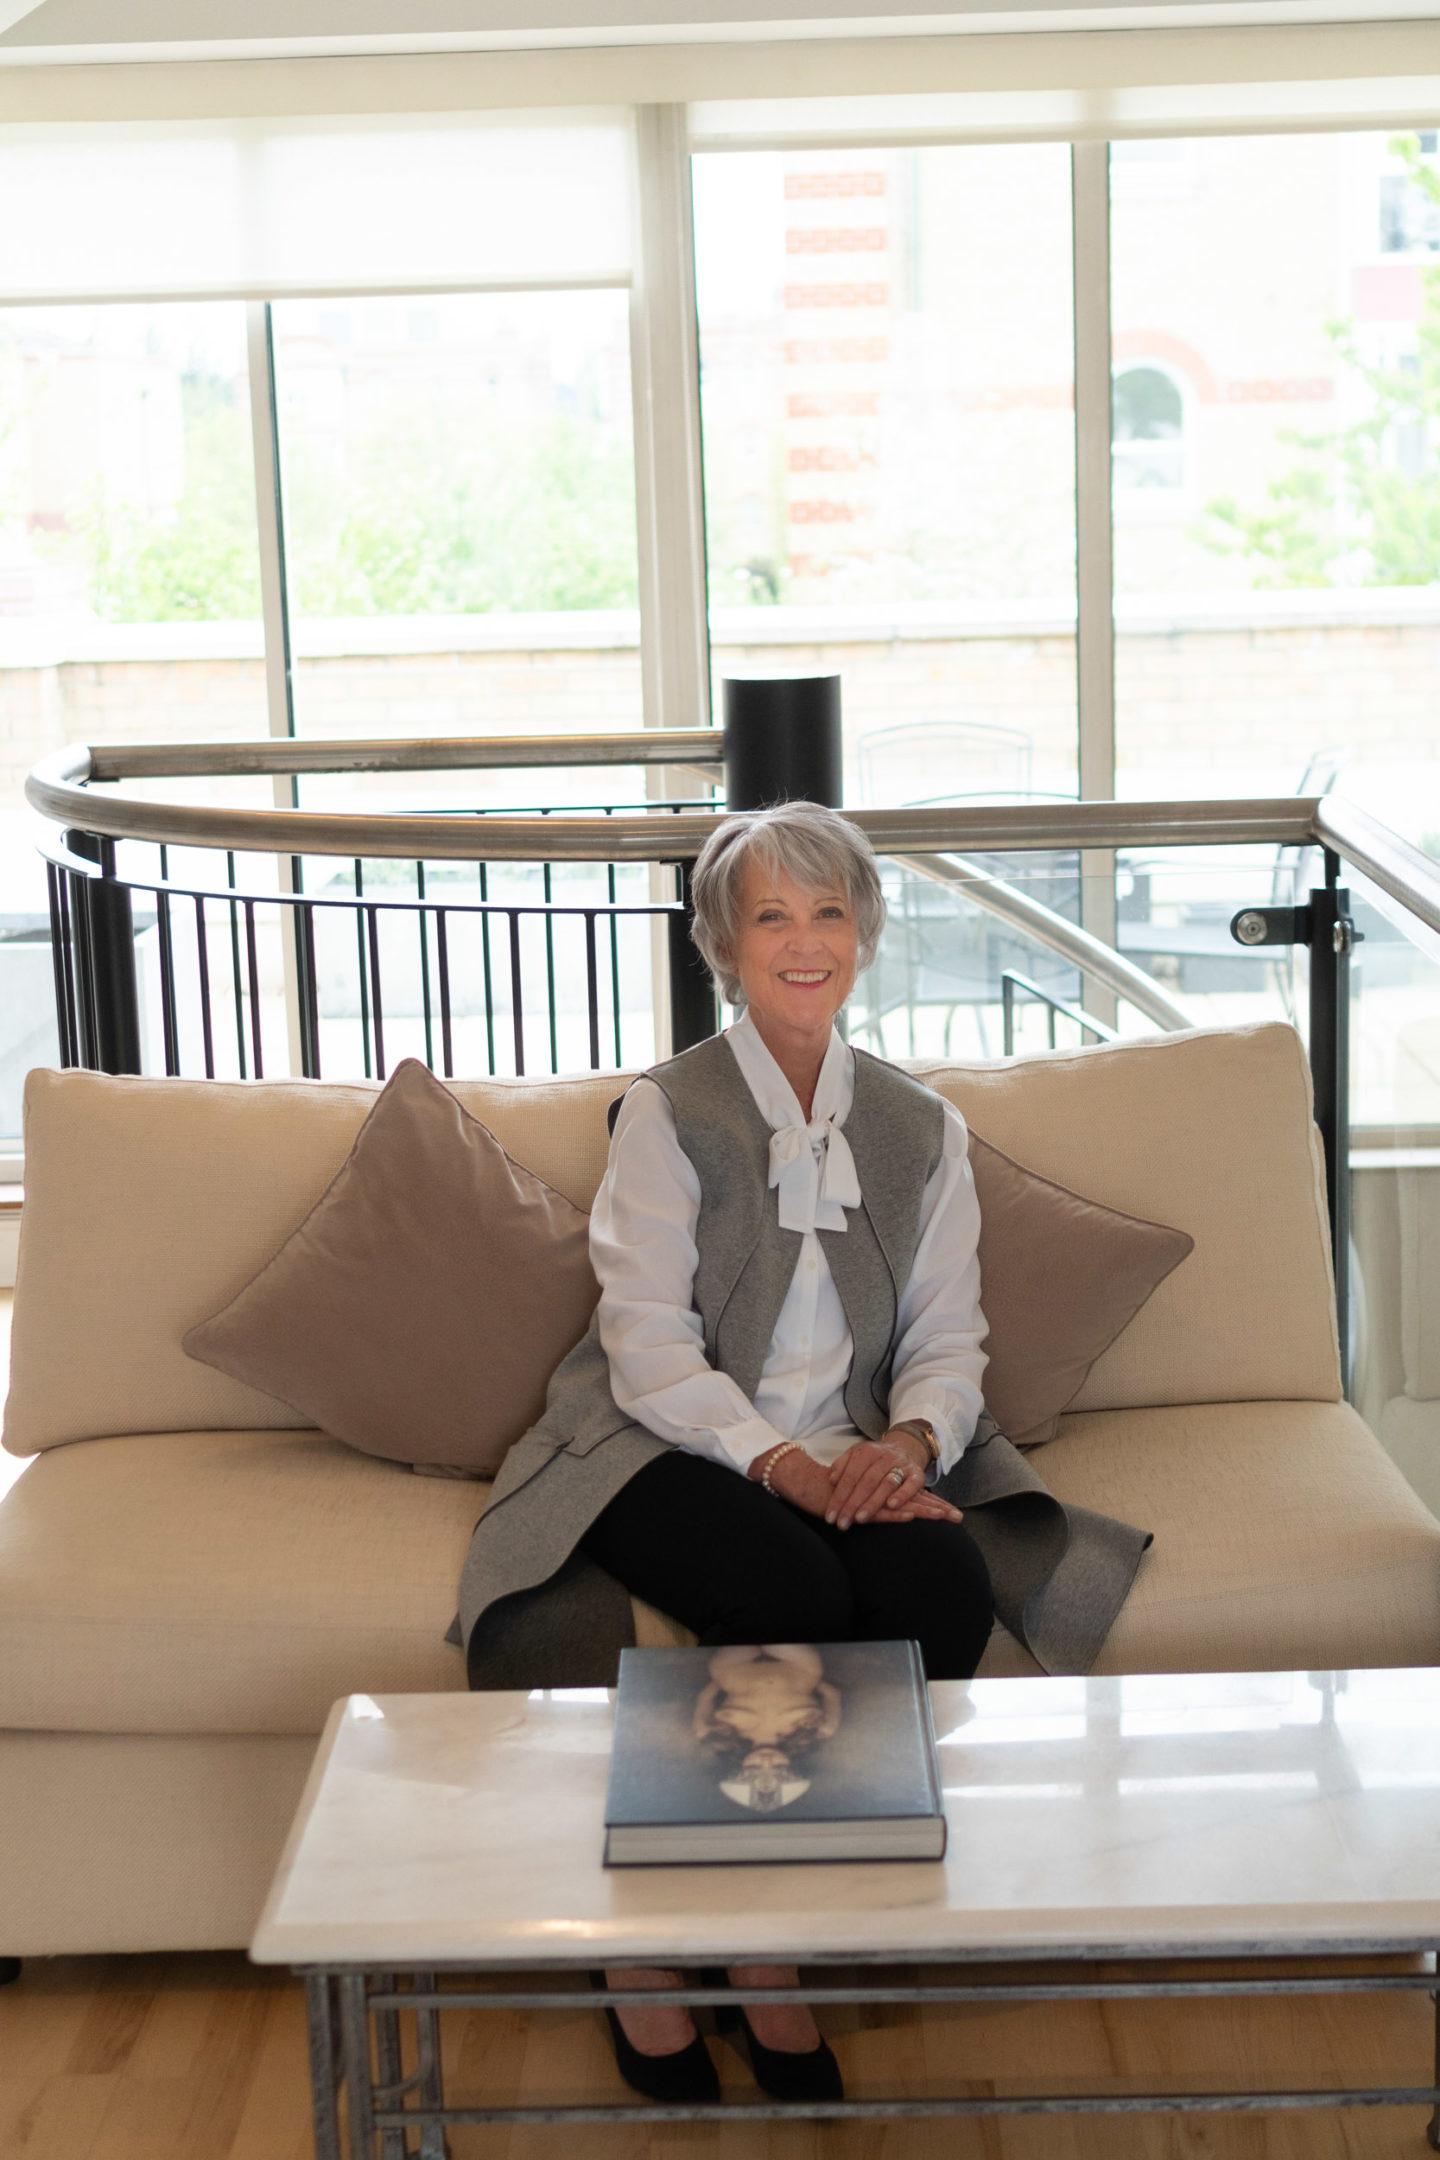 Black leggings, tie blouse & grey sleeveless coat